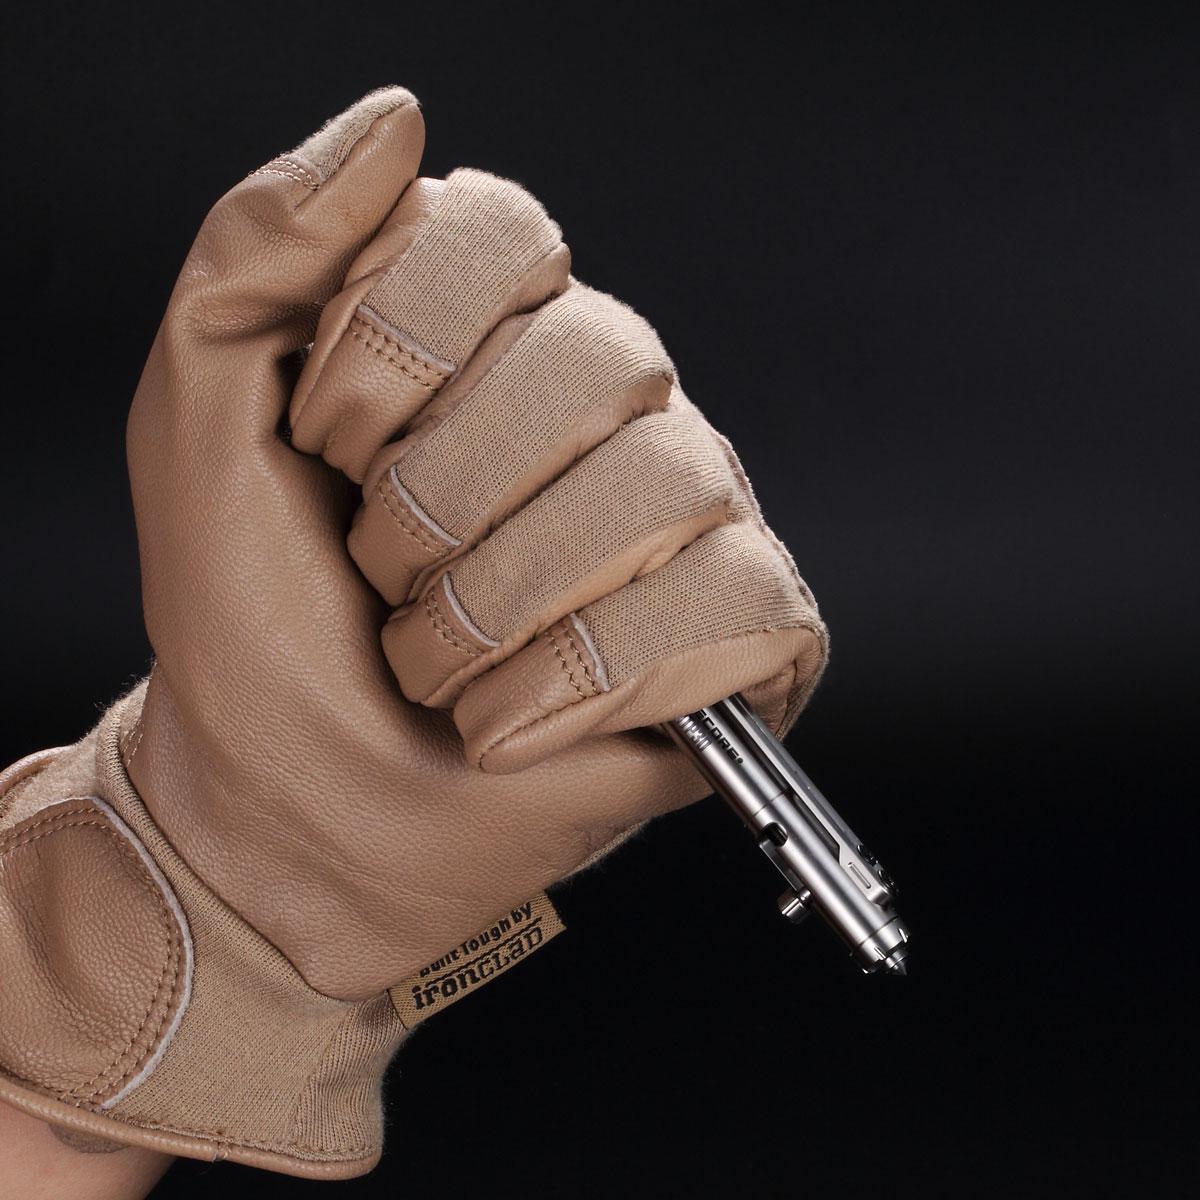 nitecore-ntp30-titanium-tactical-pen-3